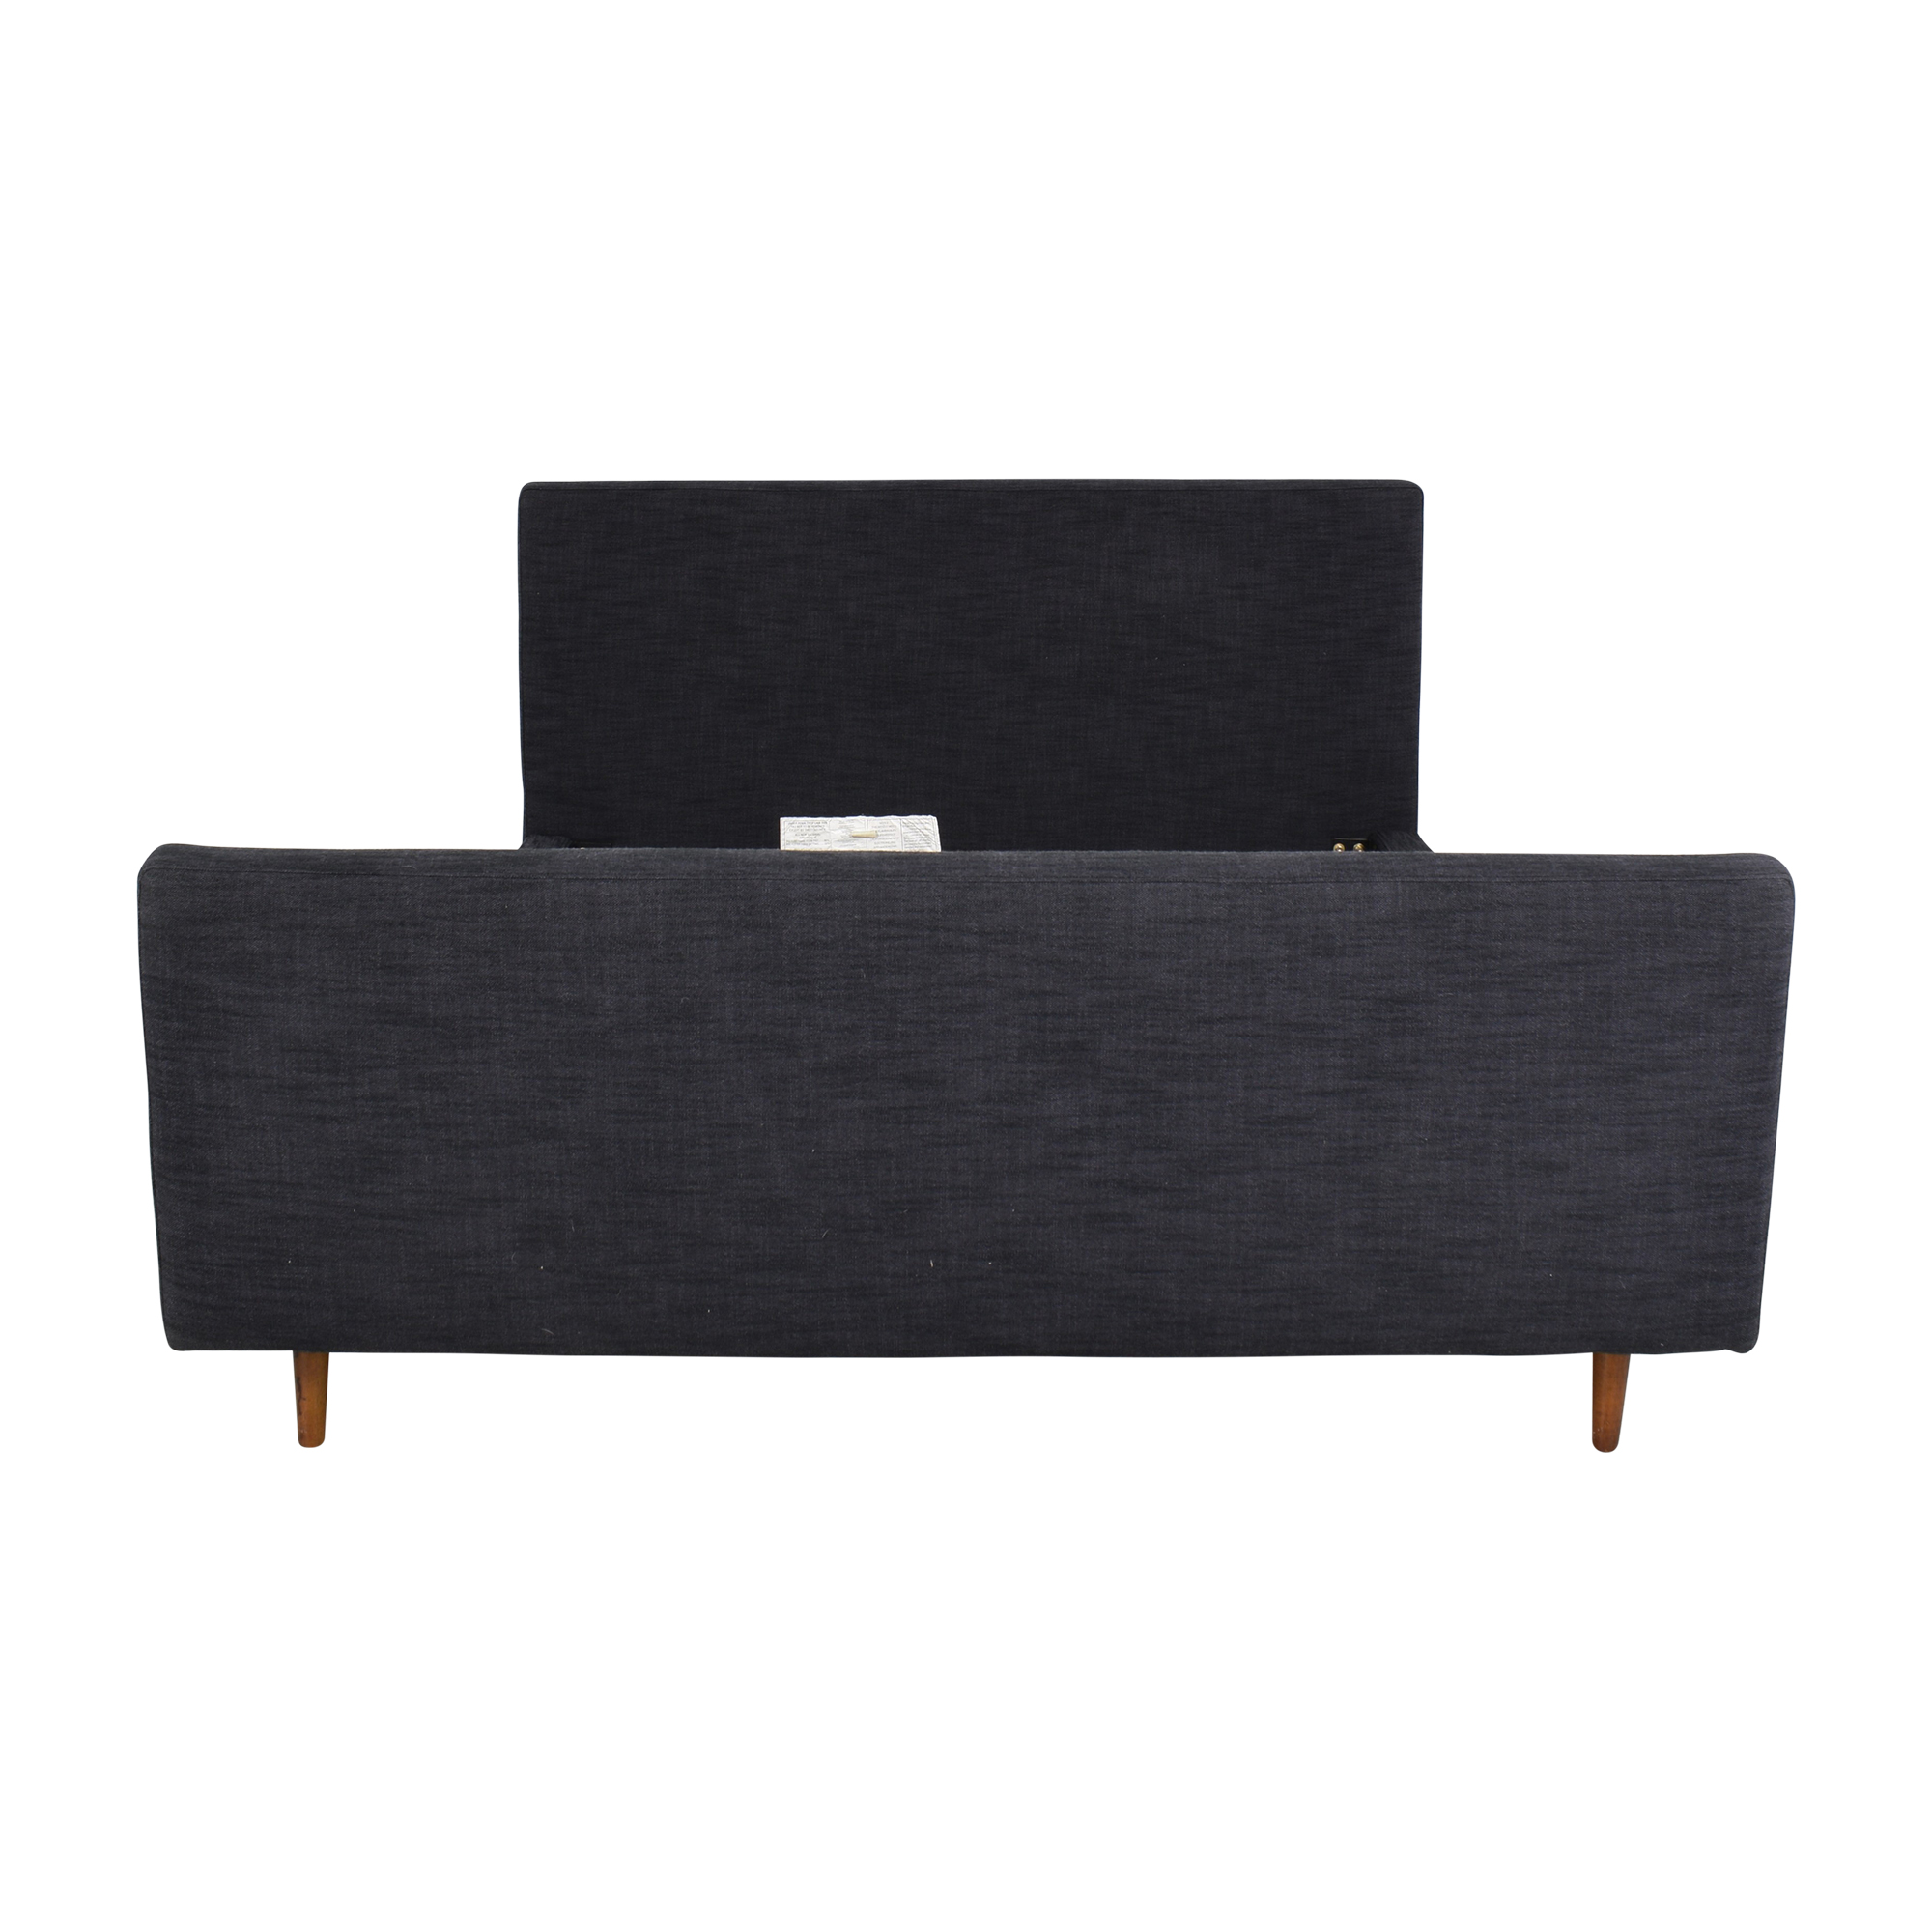 buy West Elm Queen Upholstered Bed with Footboard West Elm Bed Frames